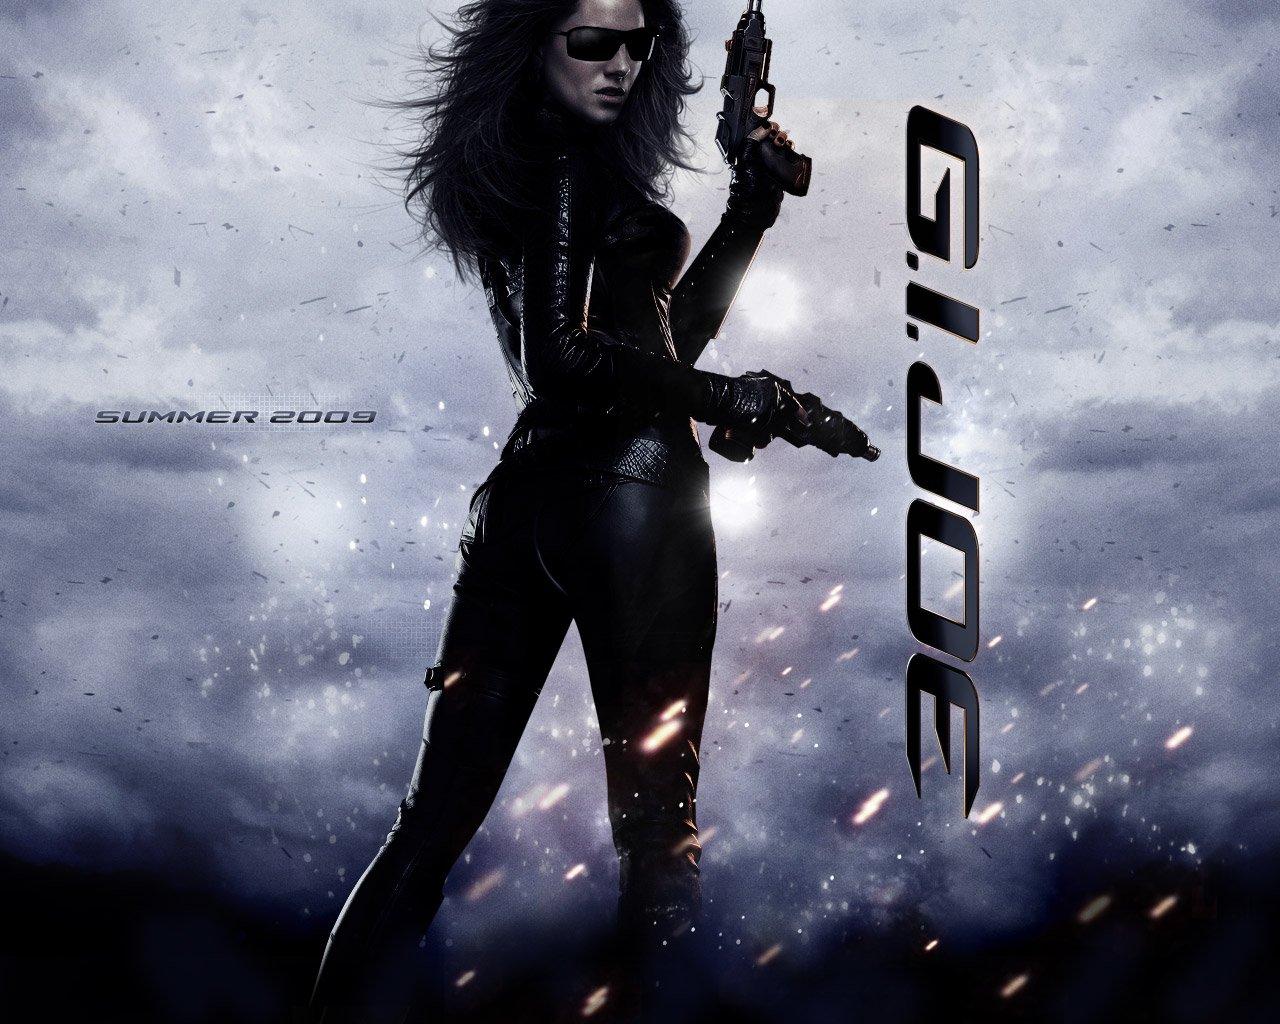 G i joe the rise of cobra free movie download.